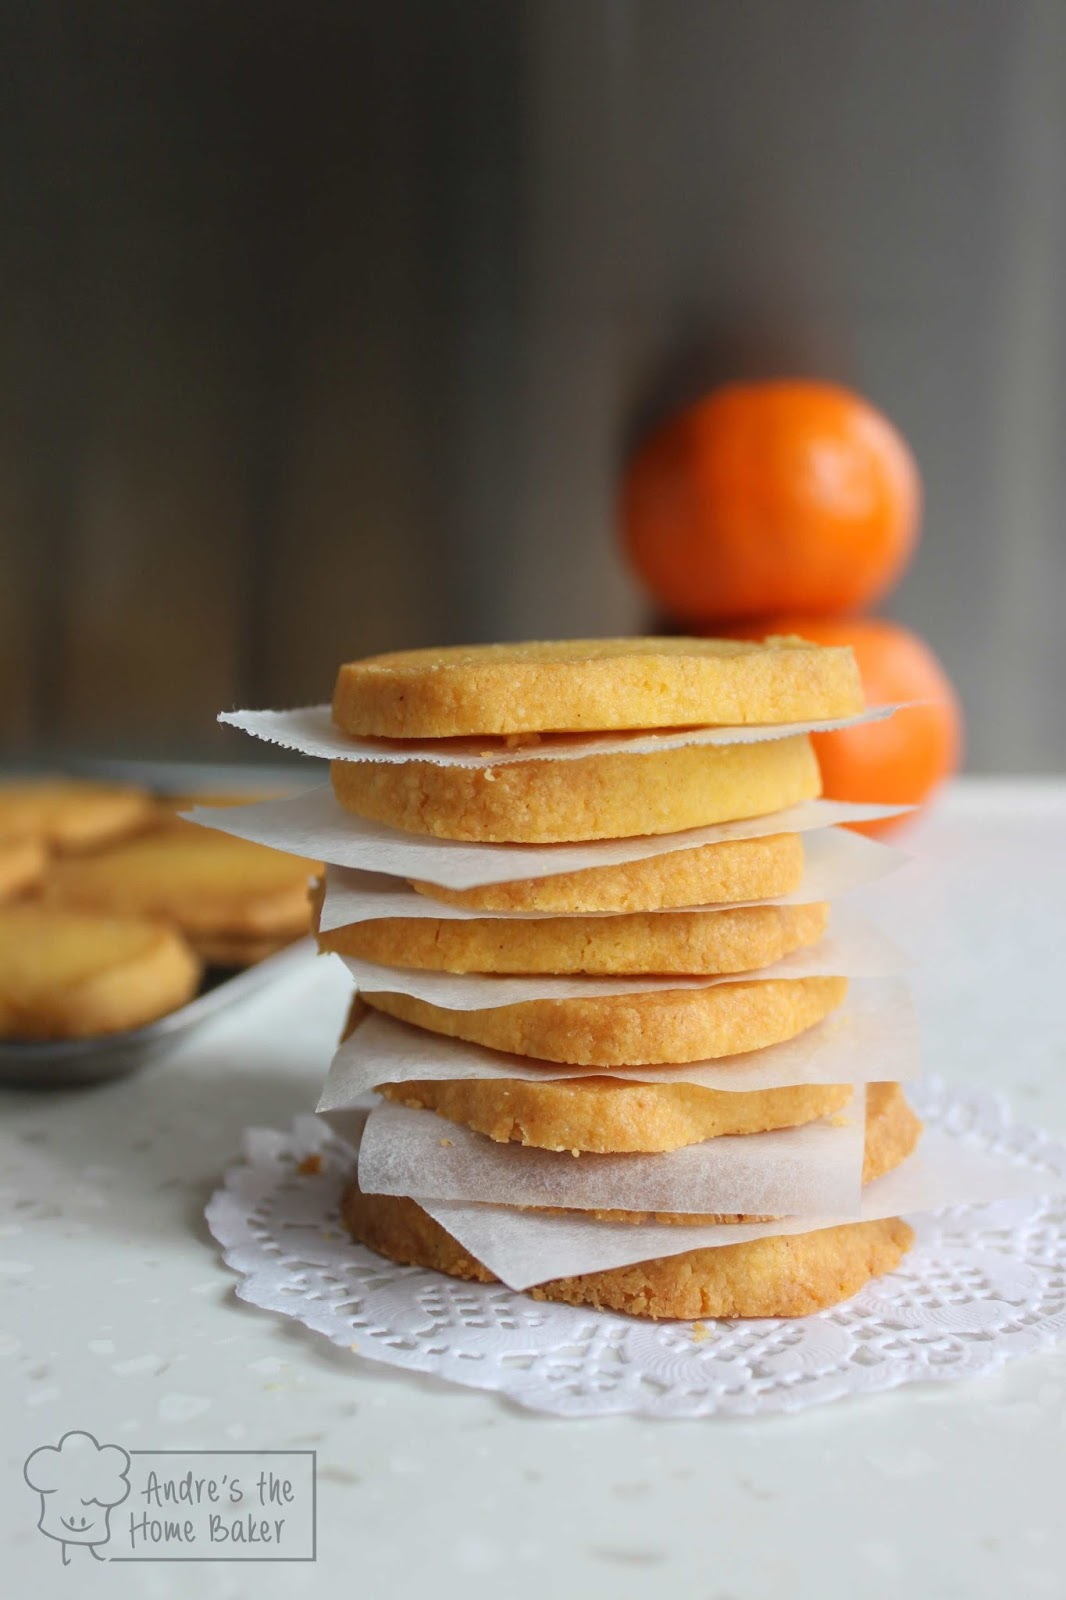 Andre's the Home Baker: ♥ Orange Cornmeal Shortbread